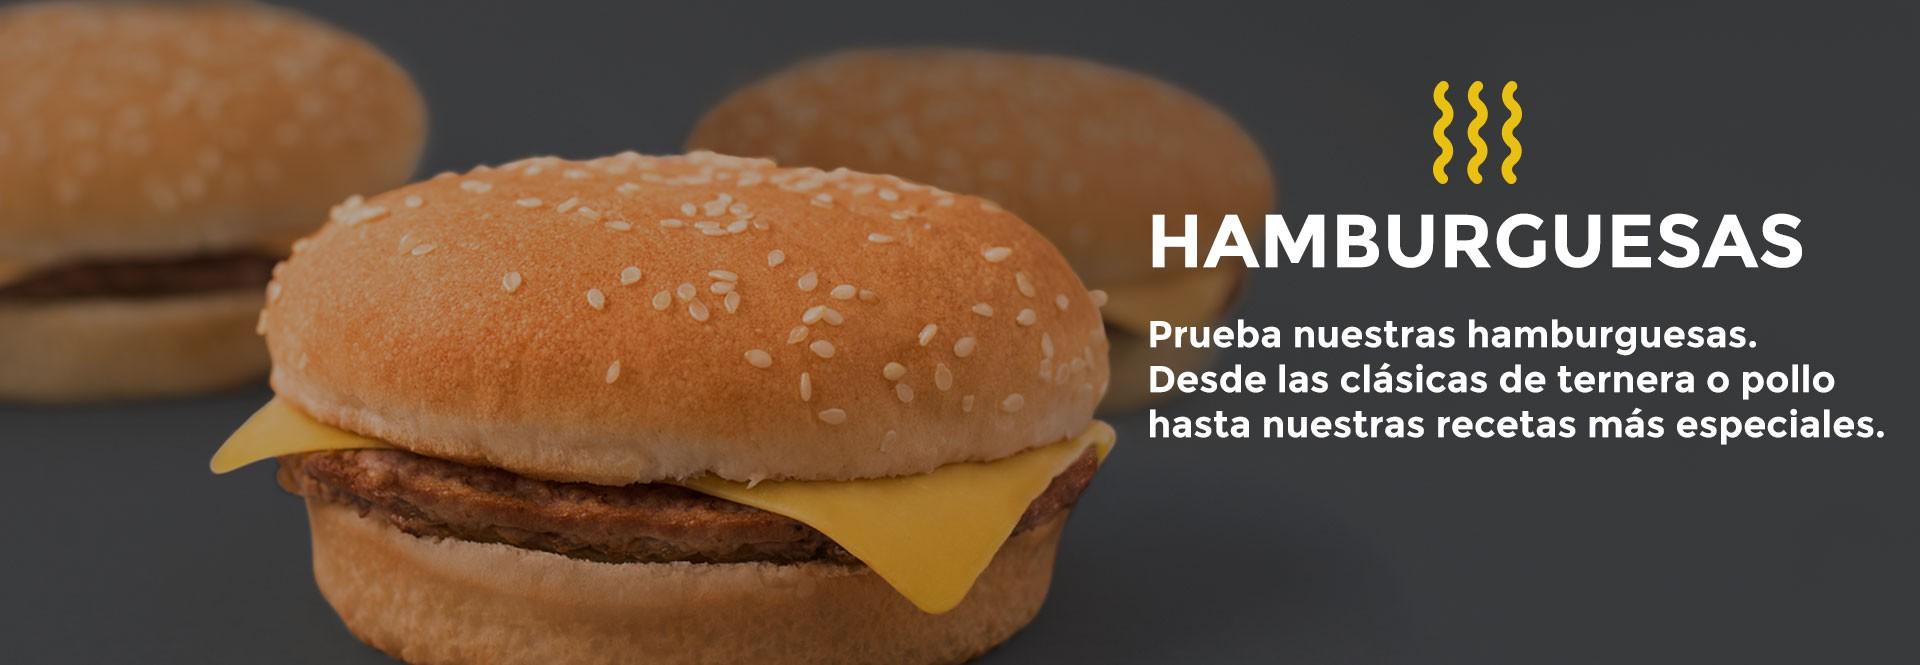 Prueba nuestras hamburguesas